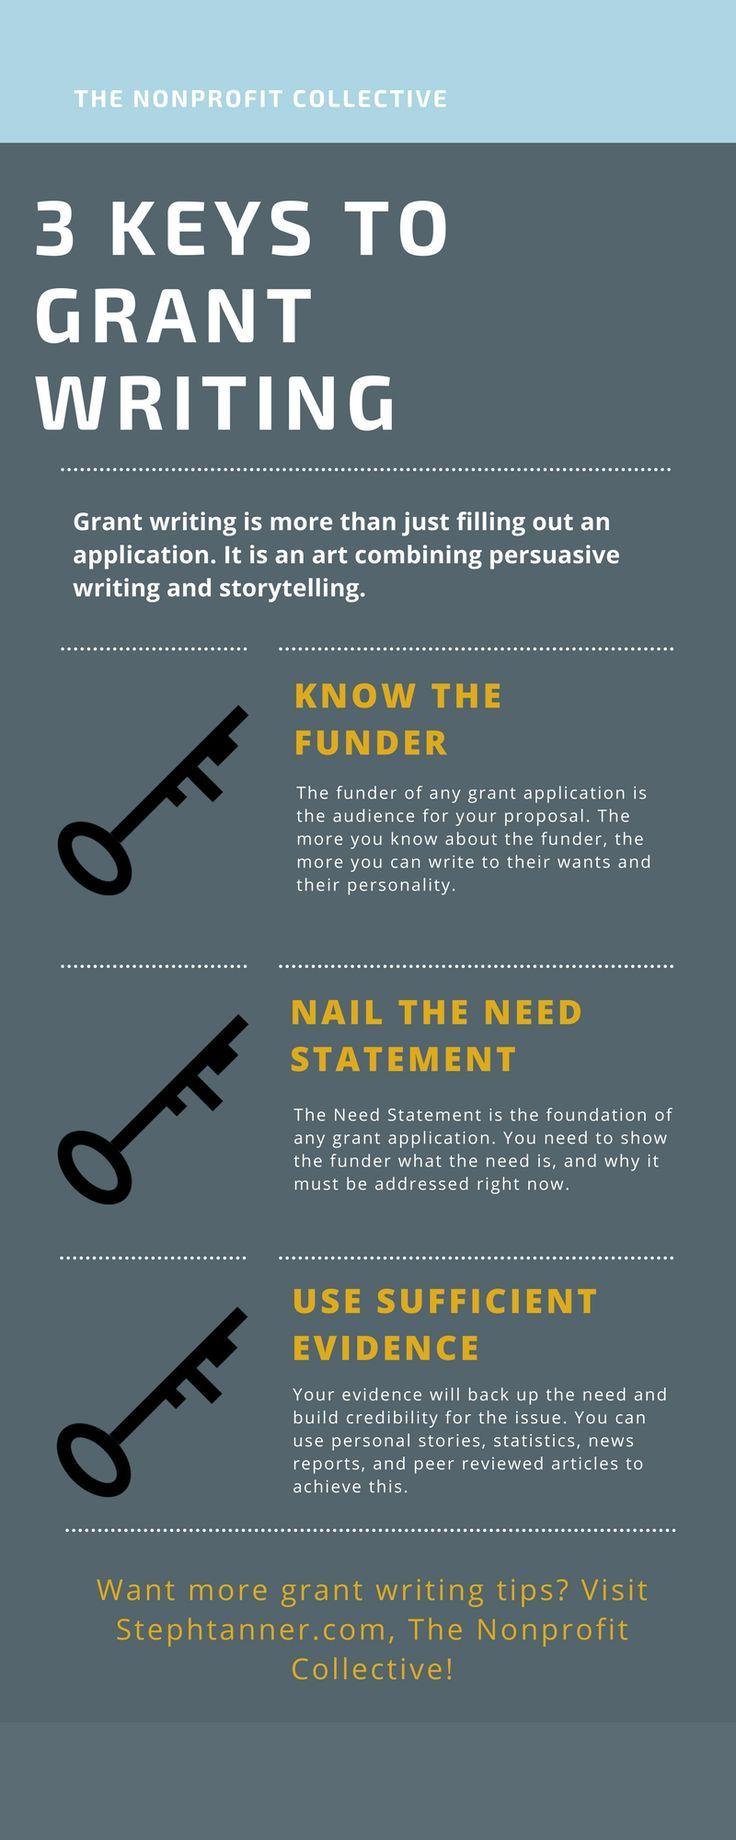 3 Keys to Great Grant Writing | Nonprofits | Pinterest